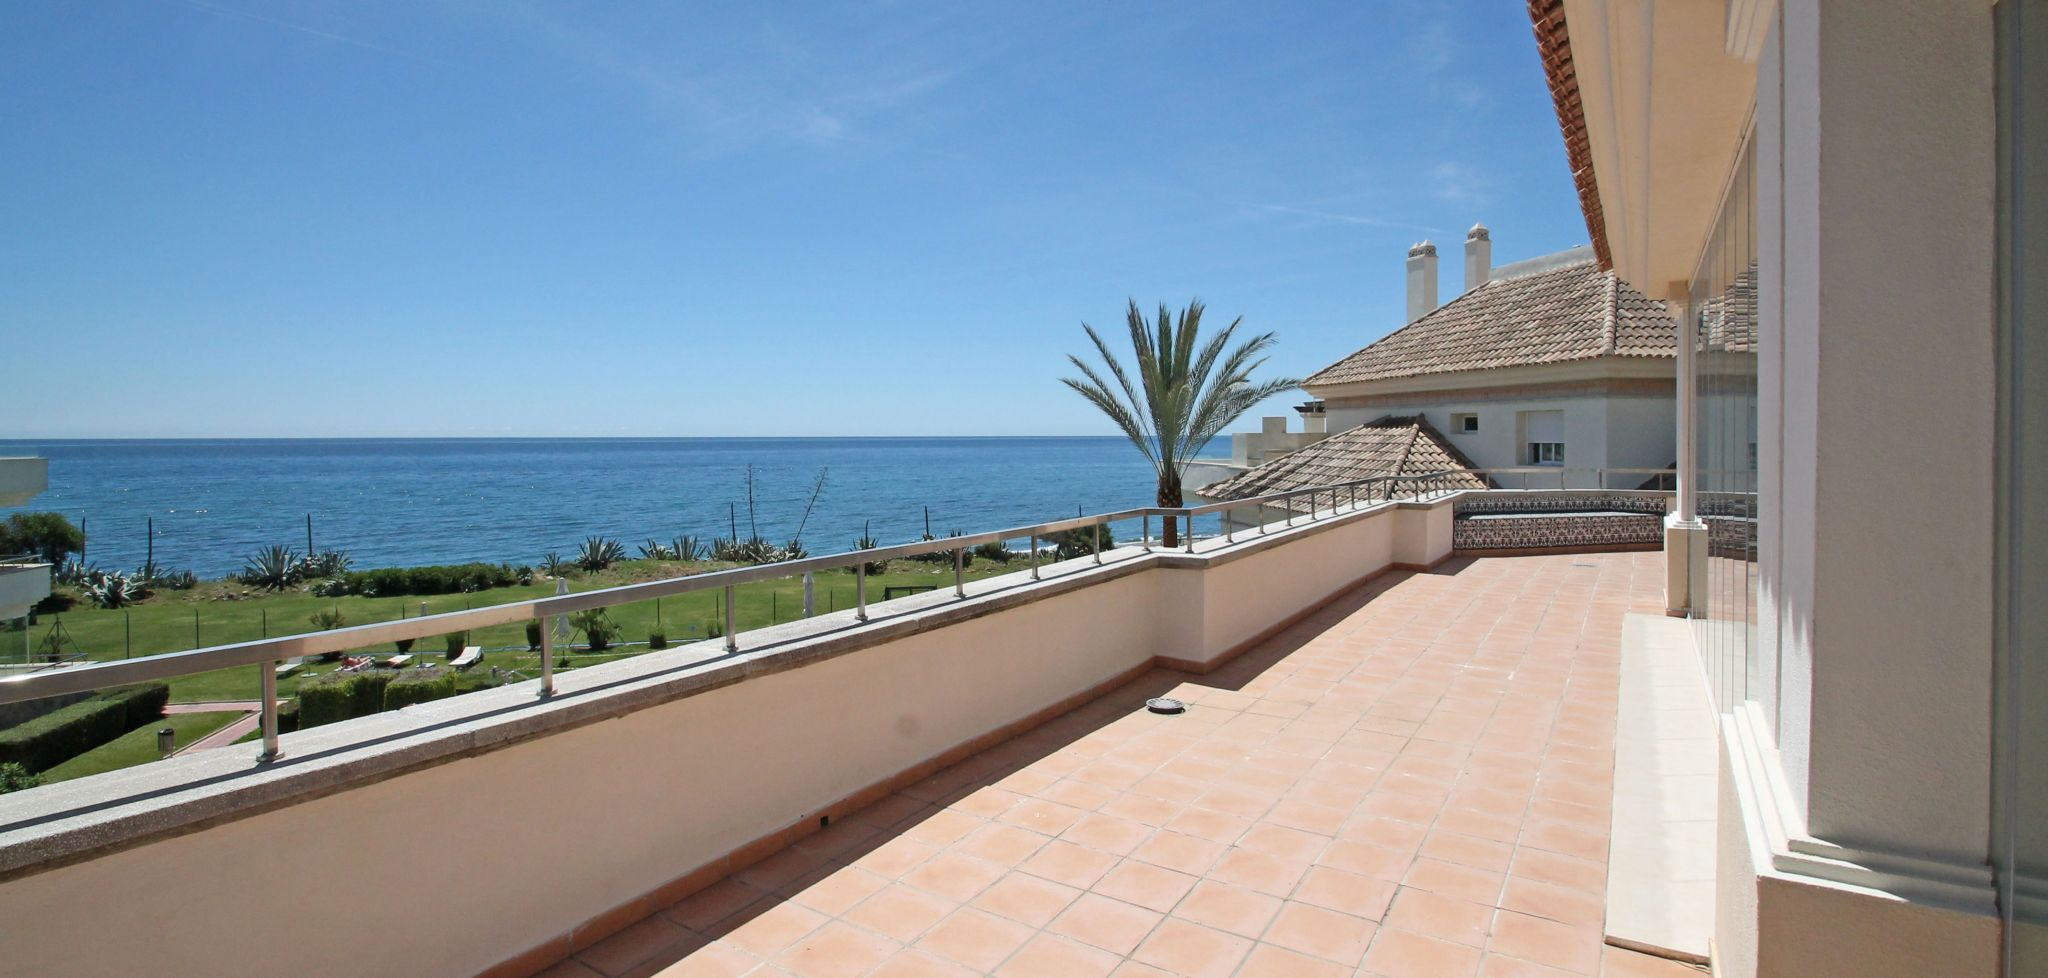 Beachfront three bedroom duplex penthouse with sea views, New Golden Mile